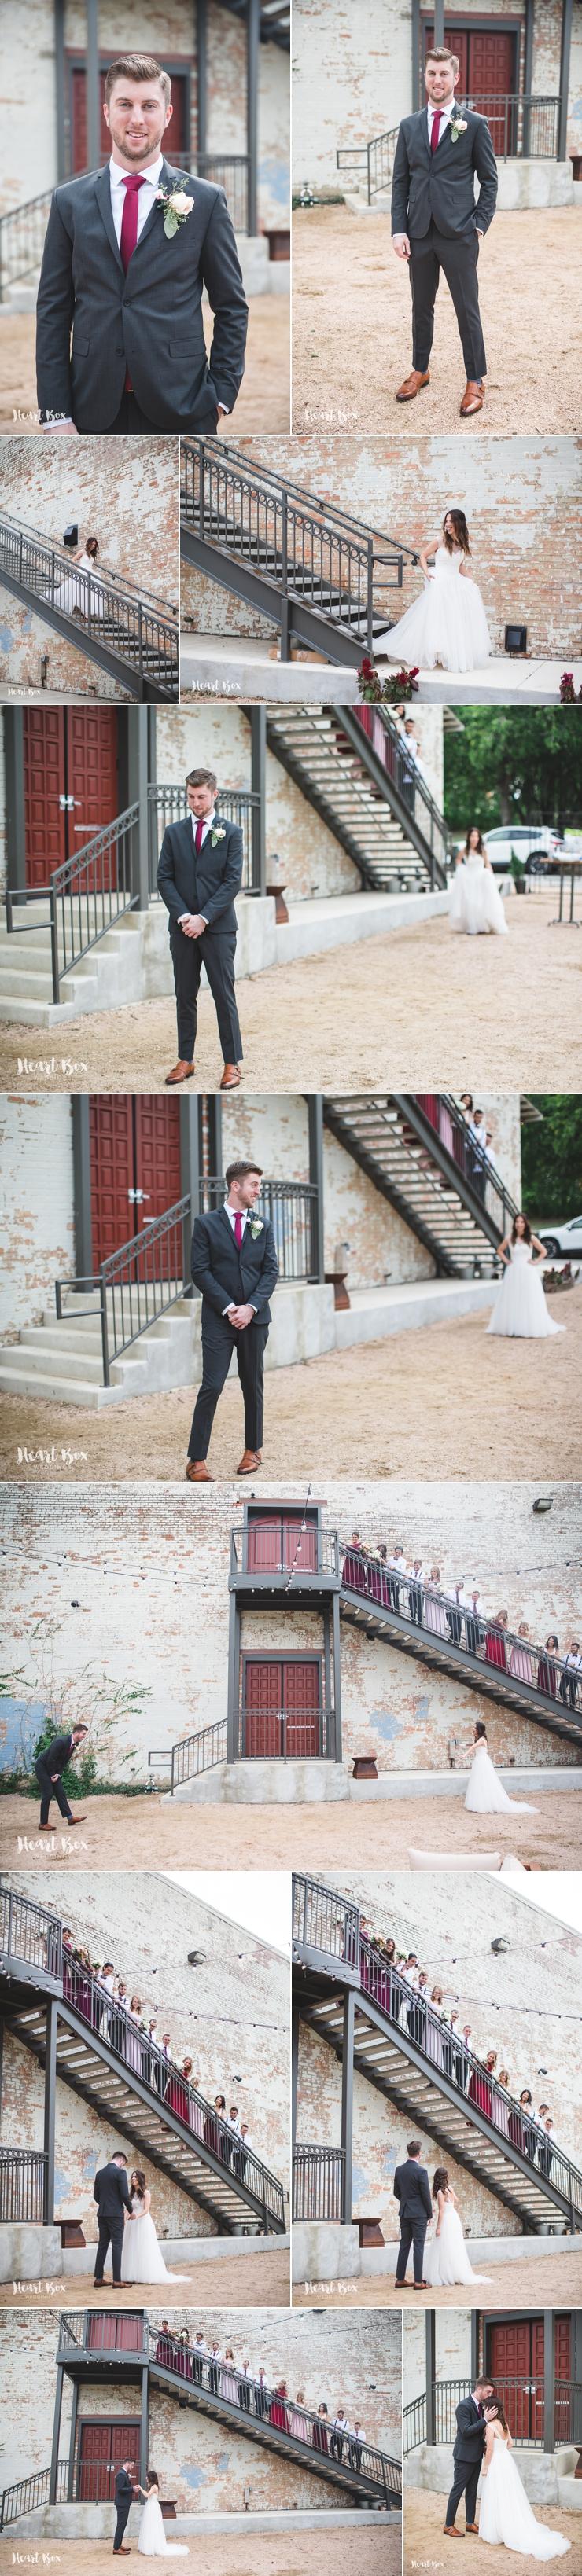 Hicks Wedding 9.jpg